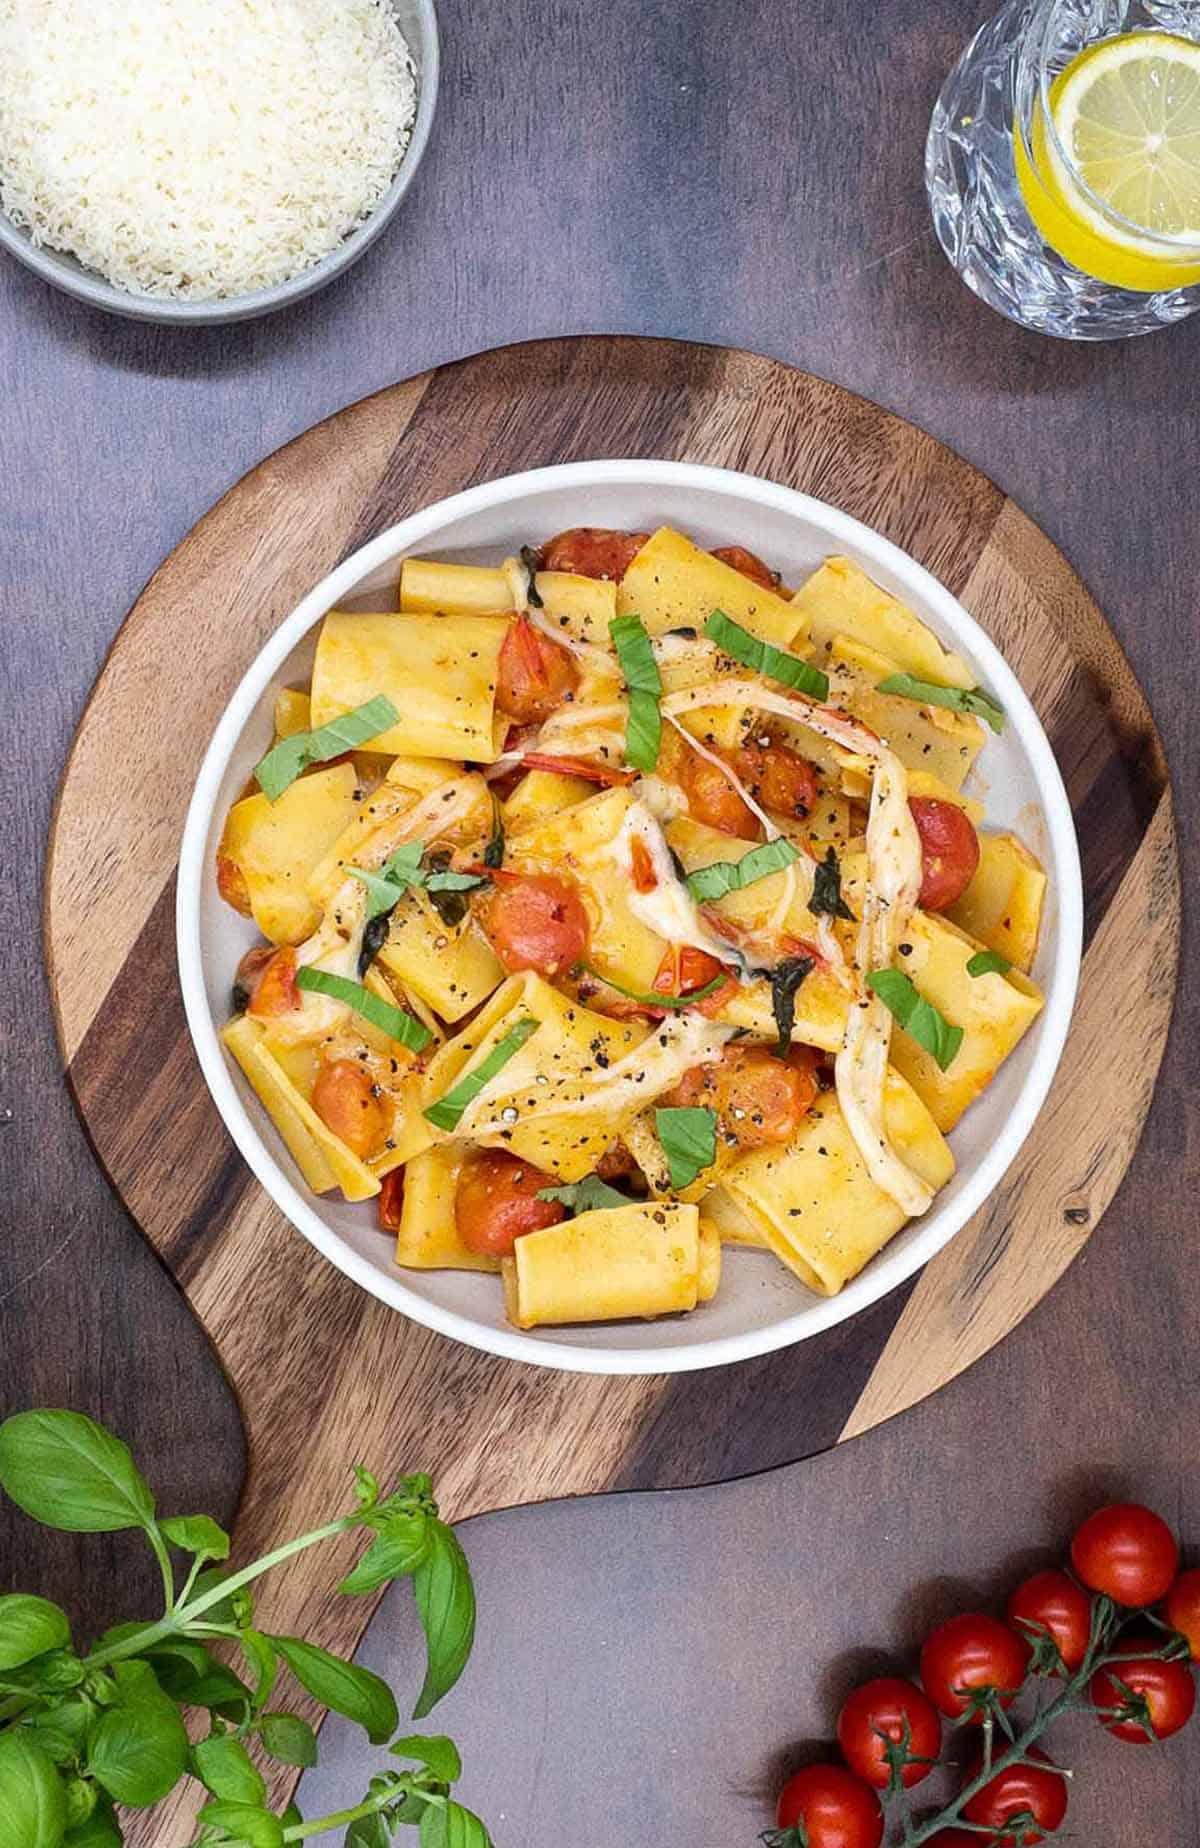 A homemade bowl of pasta alla sorrentina on a board.